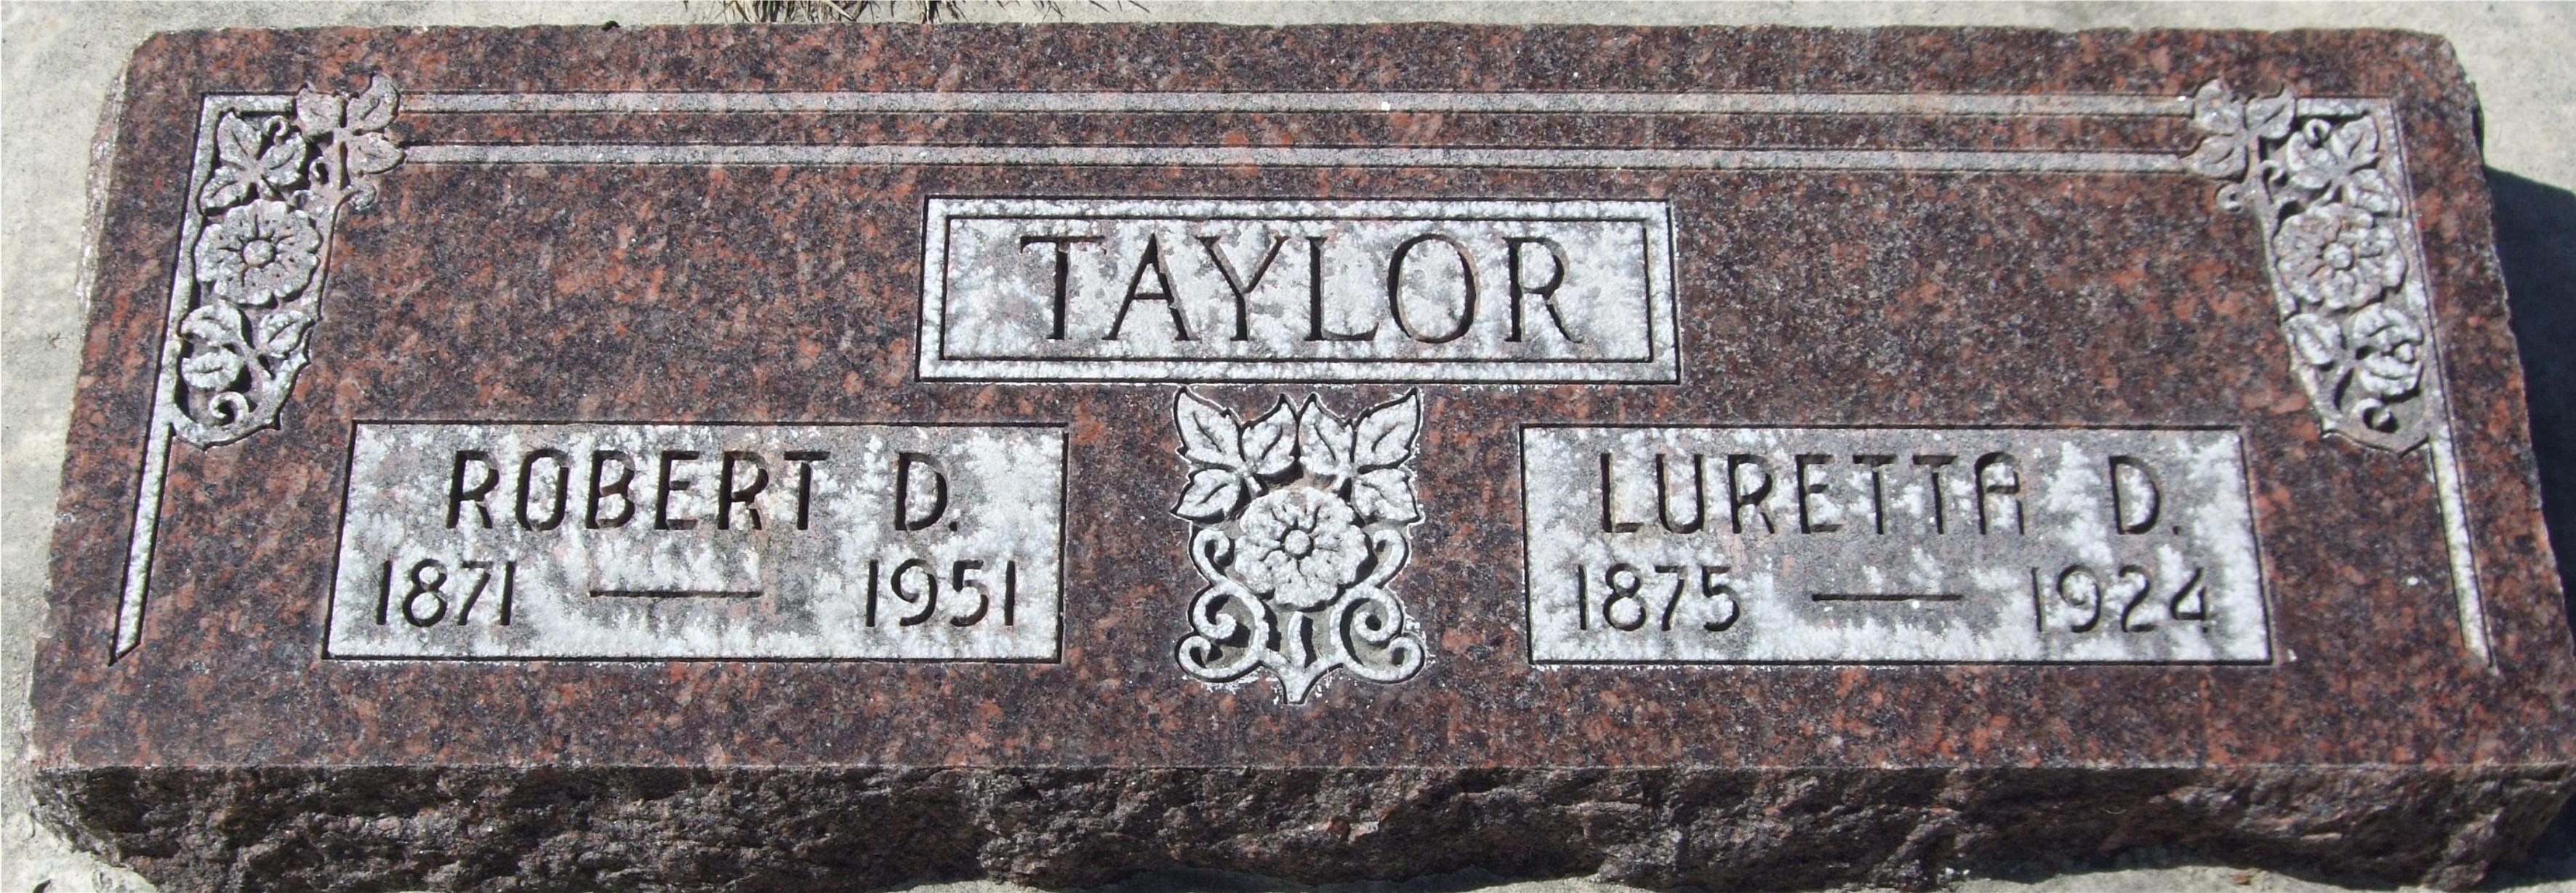 Robert Dee Taylor